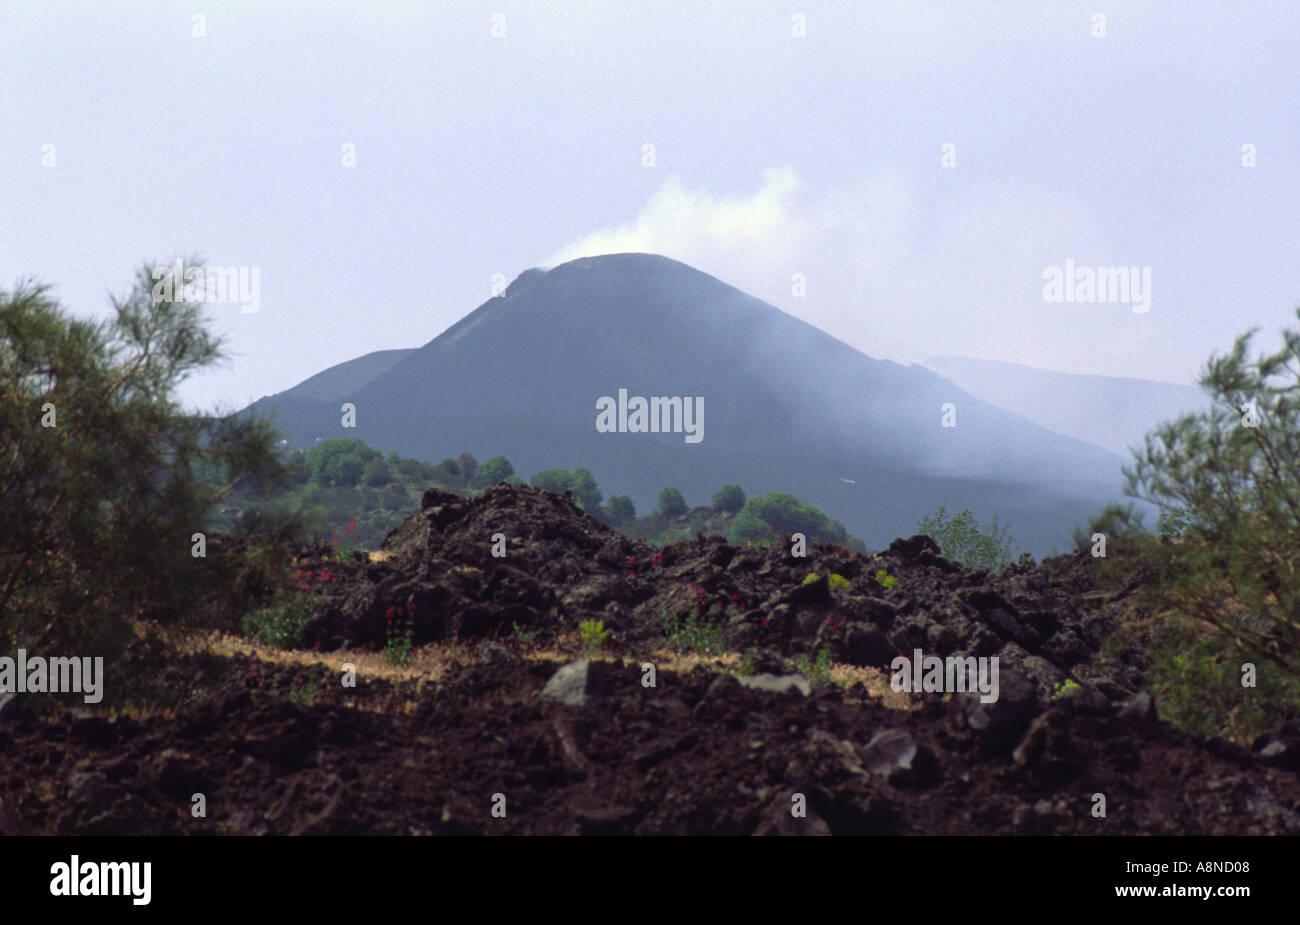 Activ Volcano Mount Etna Sicily Italy - Stock Image